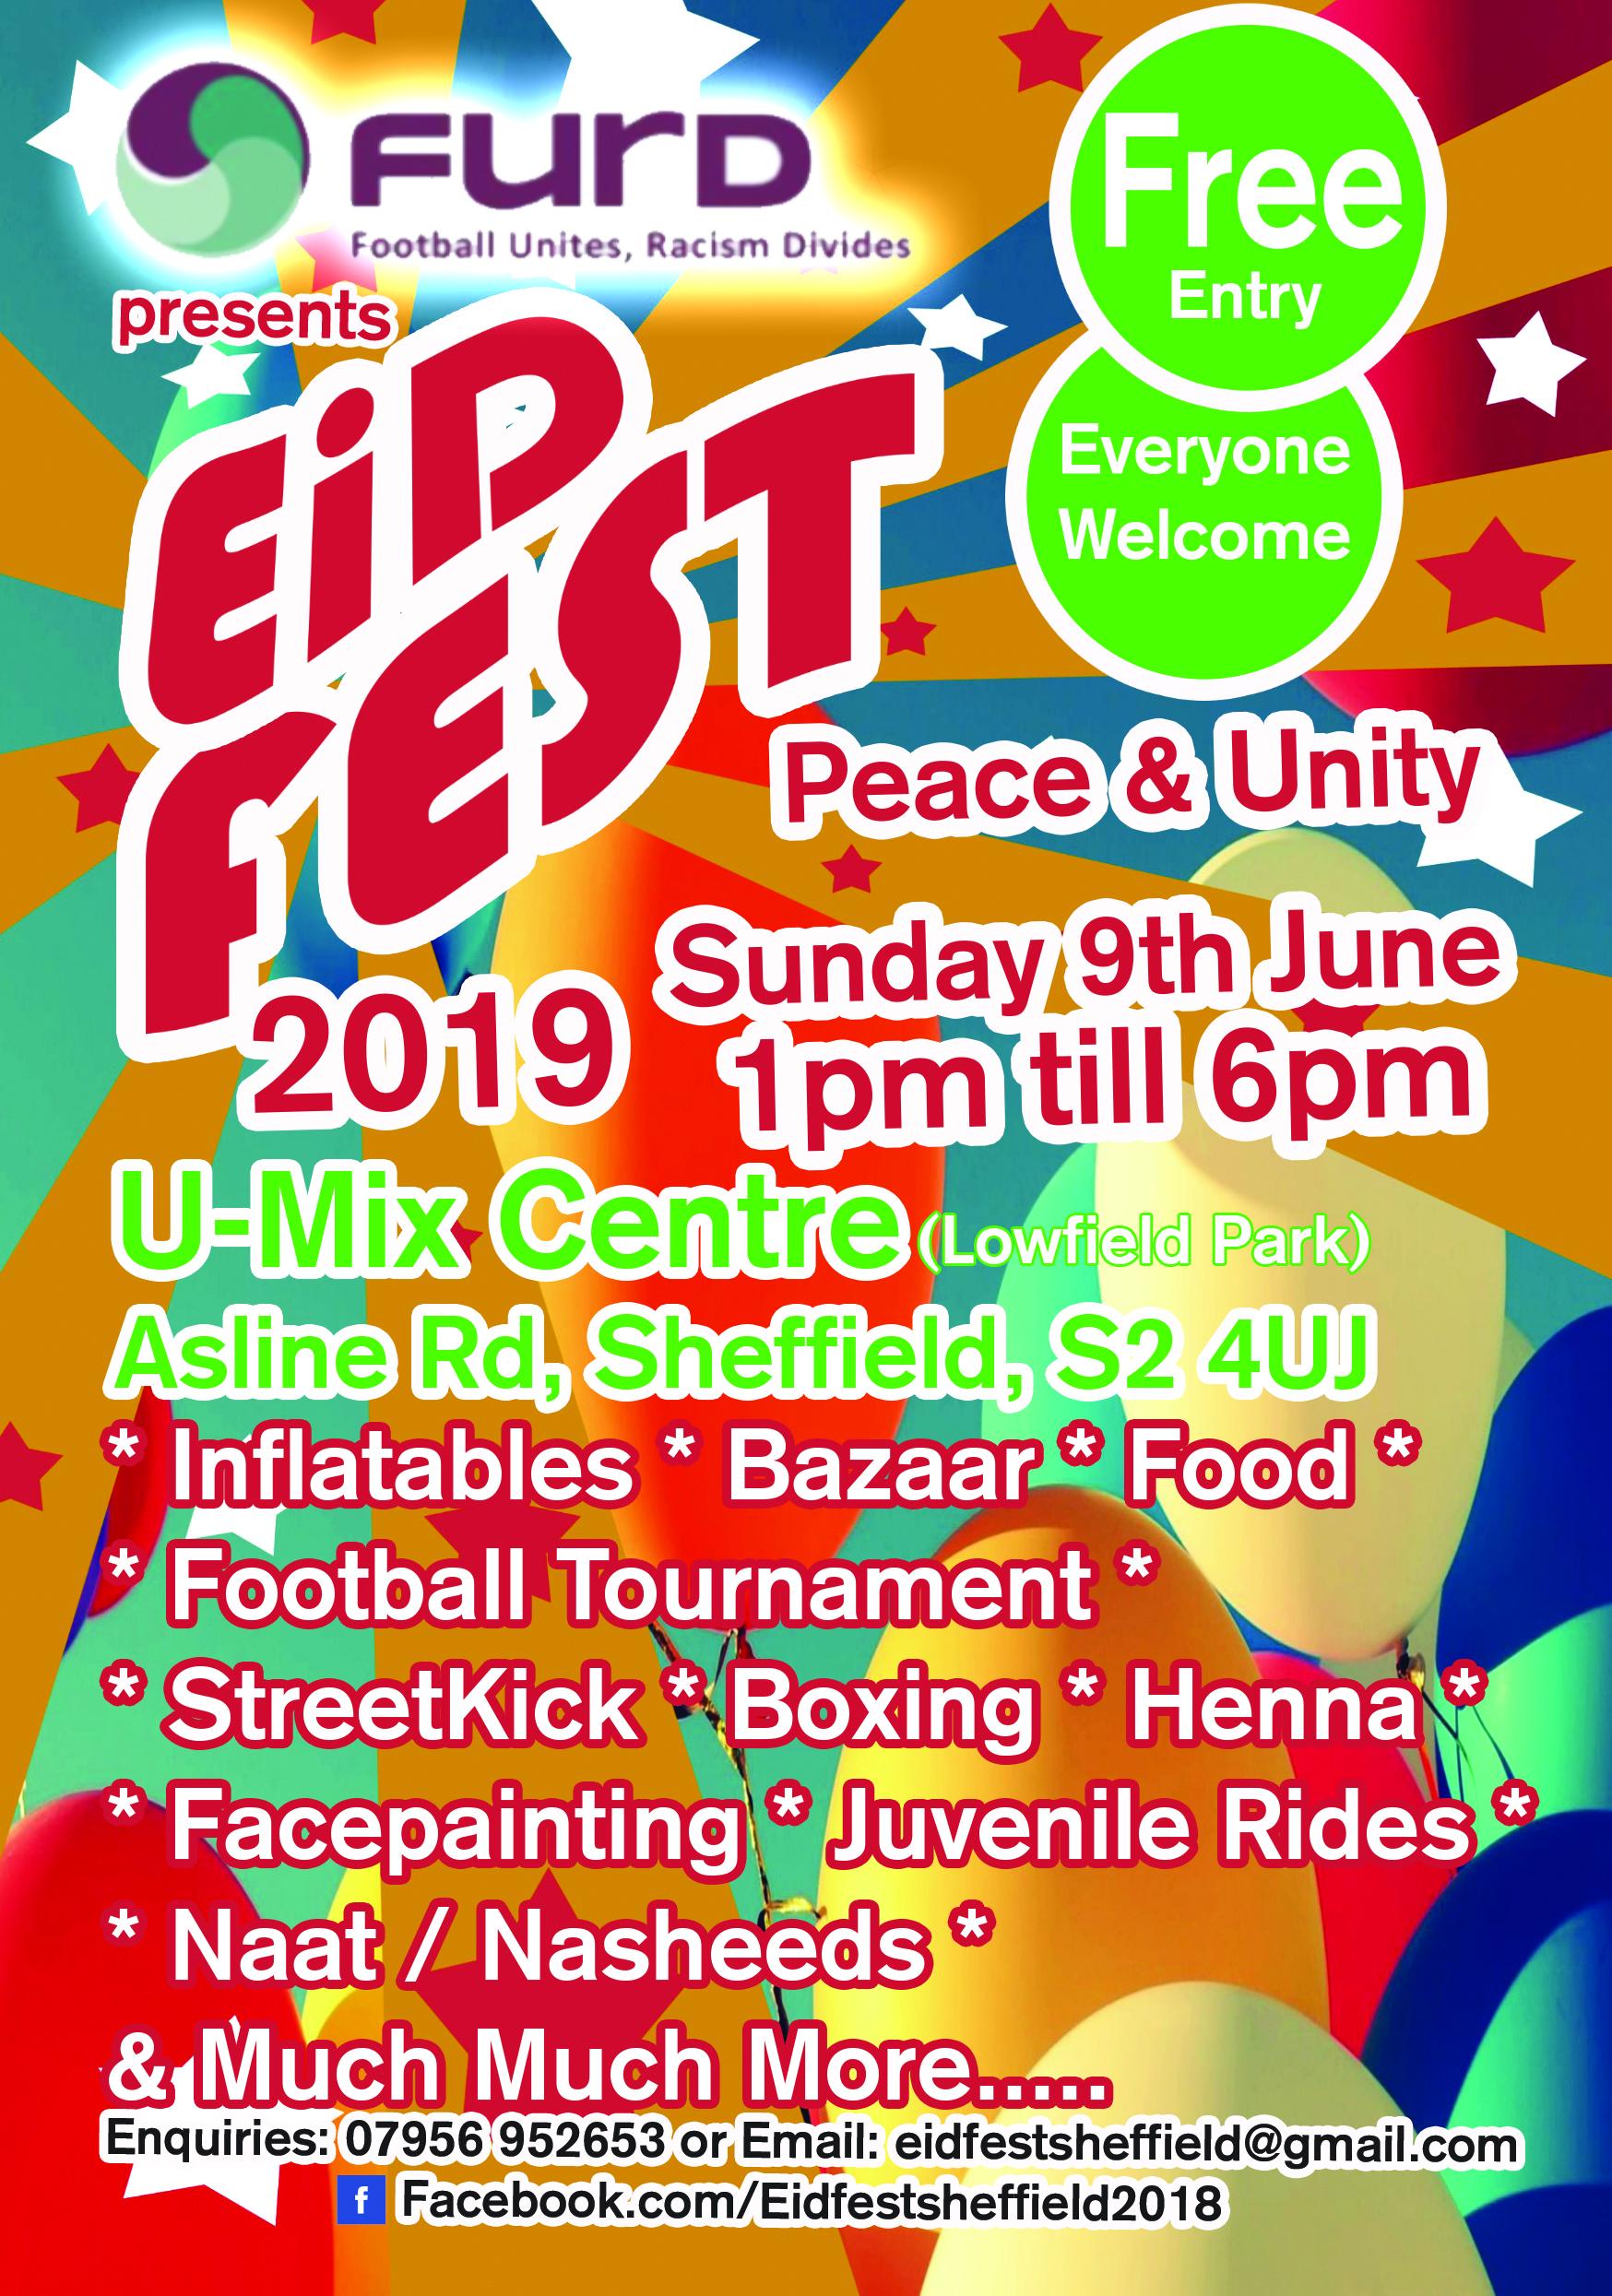 Eid festival 2019 flyer